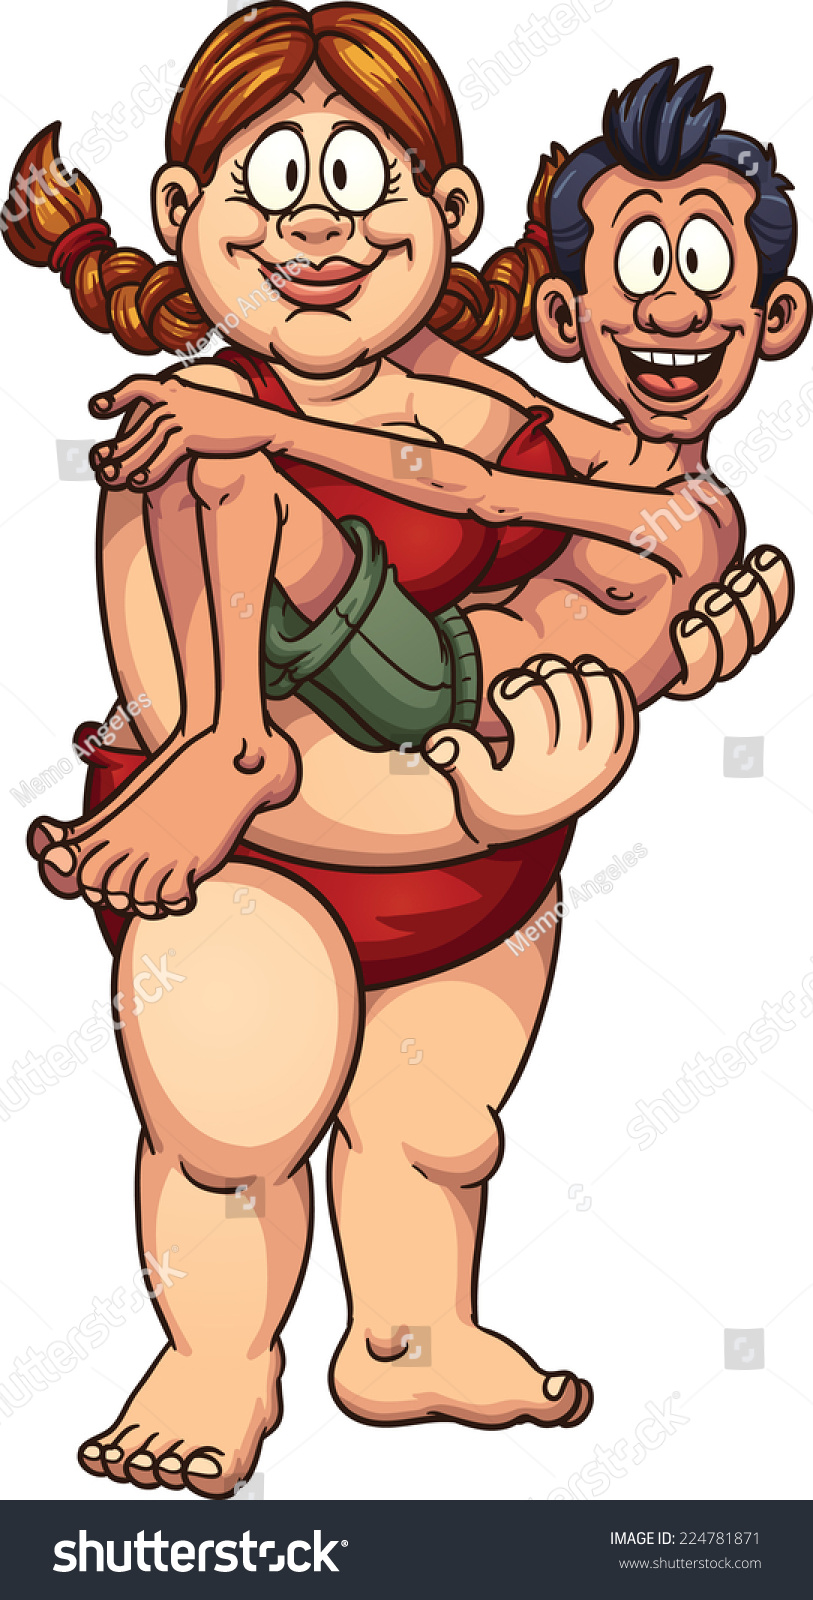 Chubby men skinny women